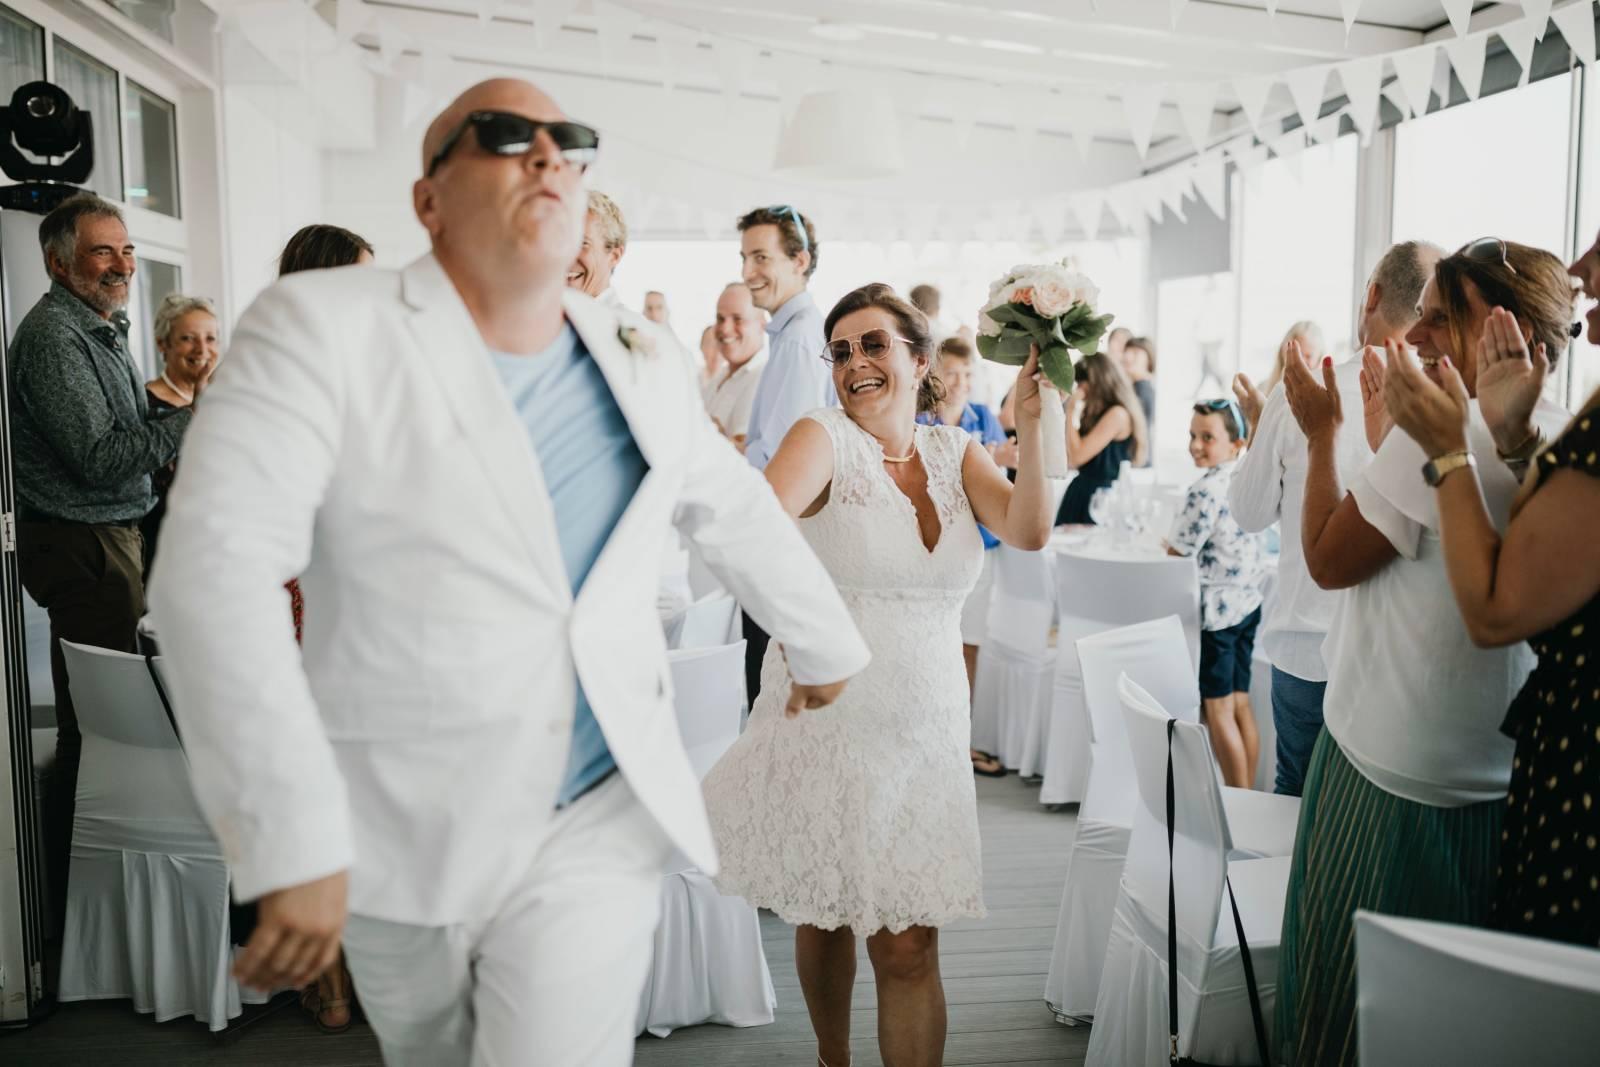 Imperish Weddings & Photography - Trouwfotograaf - Huwelijksfotograaf - Bruidsfotograaf - House of Weddings - 26